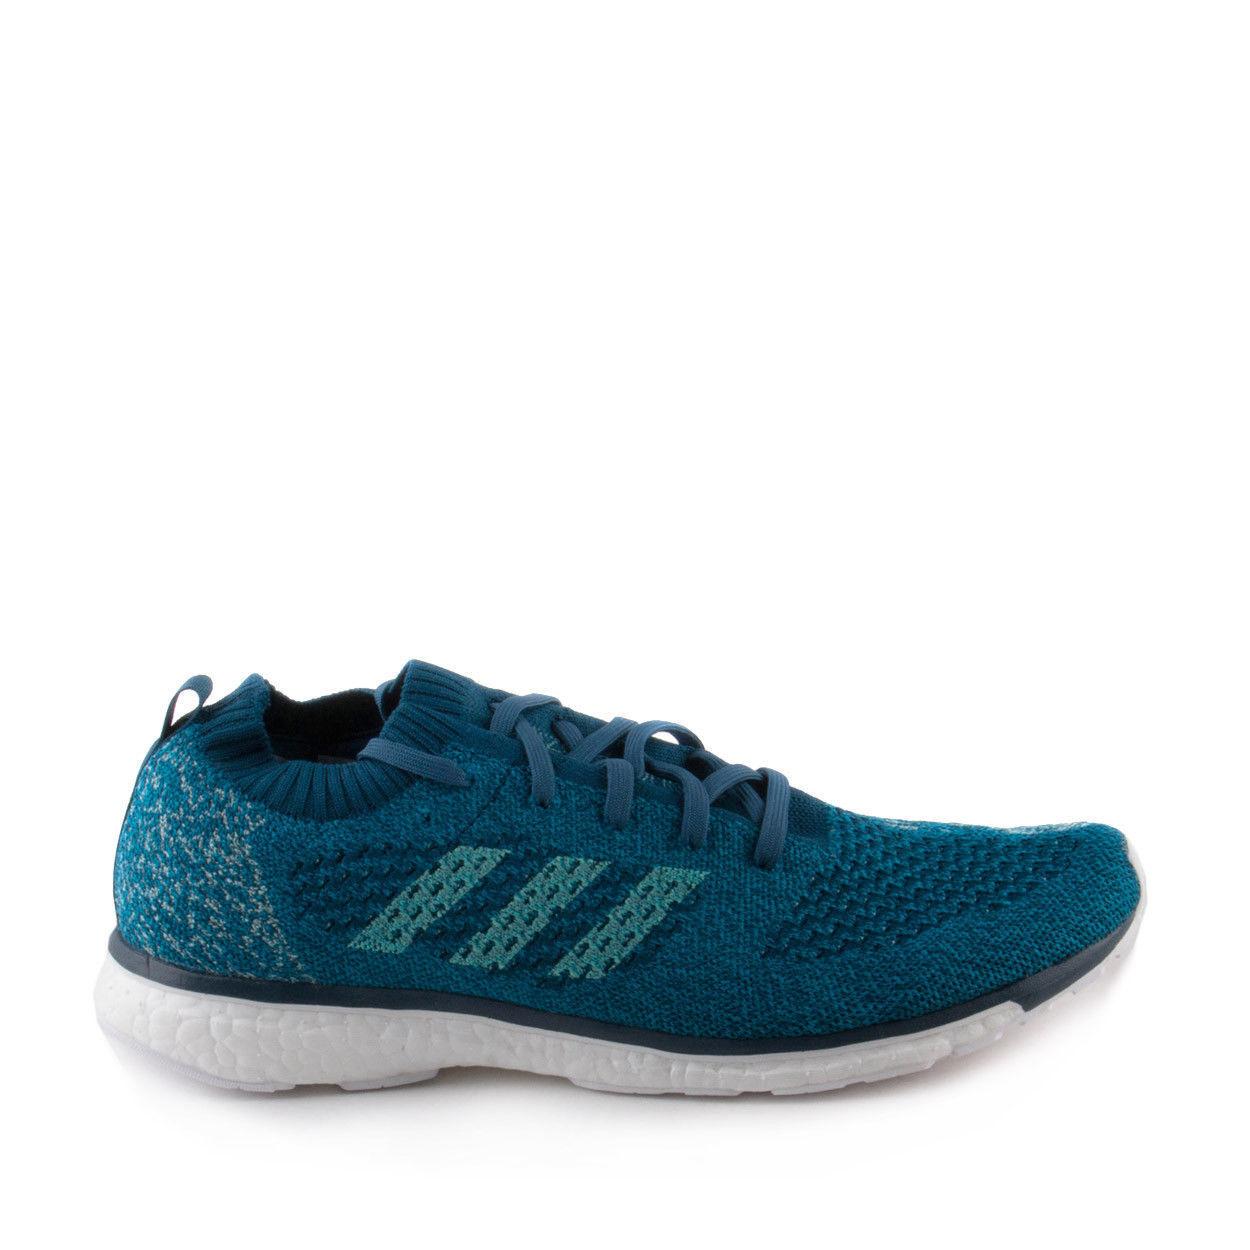 800c737a0 Спортивная обувь для мужчины ADIDAS Adizero Prime LTD Parley Boost Sneakers  Running Shoes Blue CQ1858 SZ 12 - 254049496292 - (США)